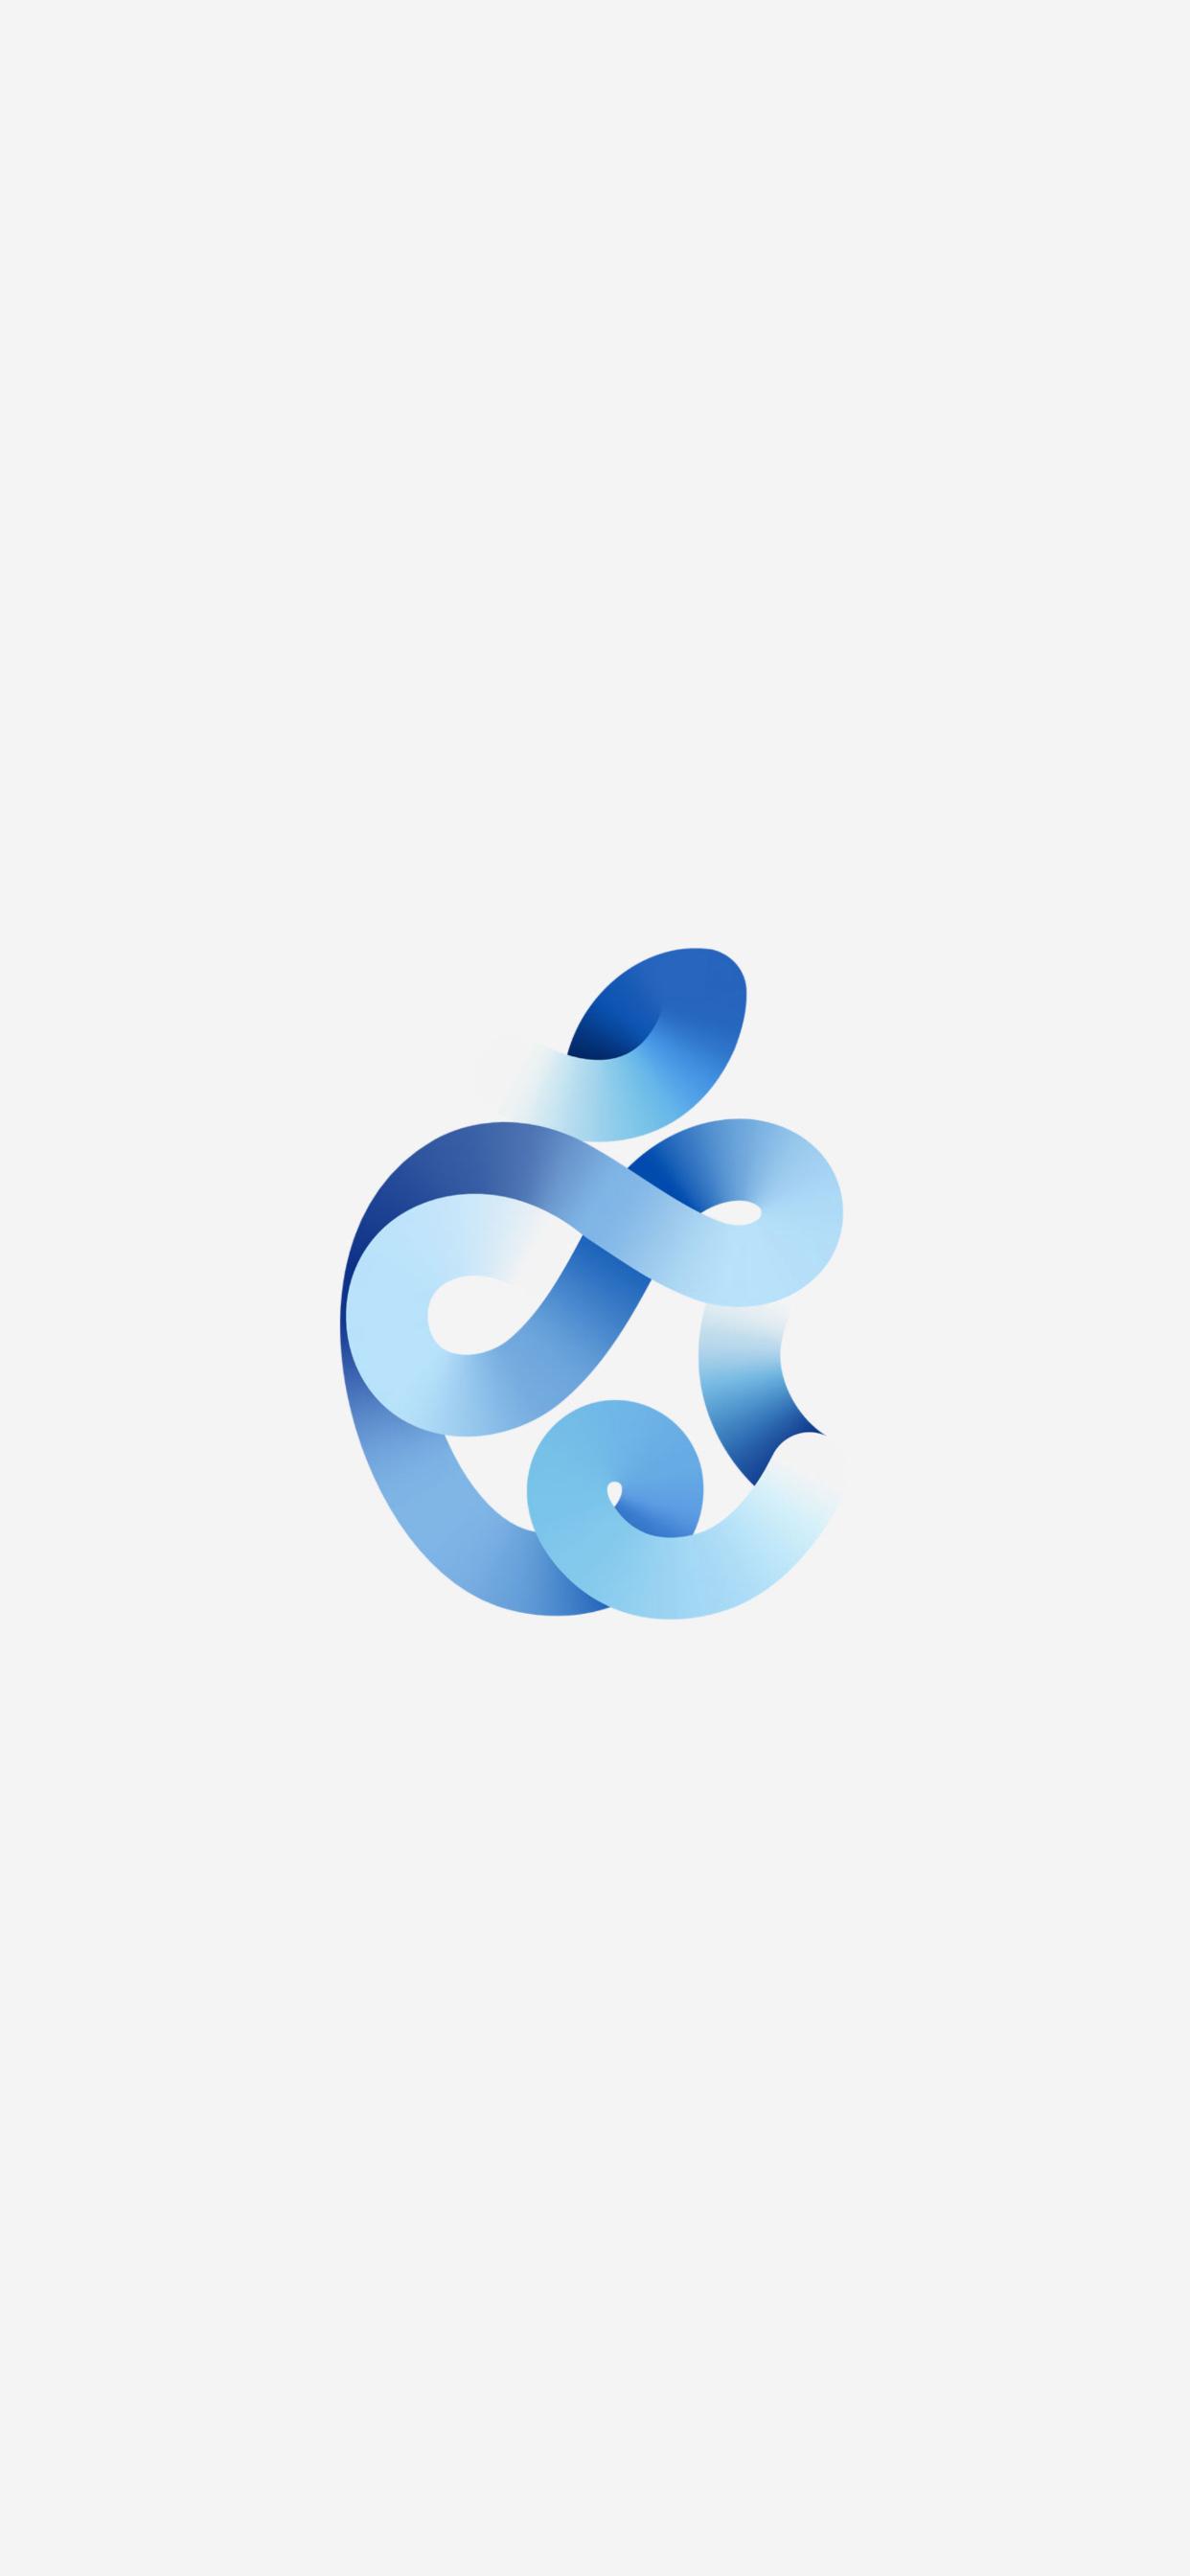 Apple September 15 Time Flies Event Wallpapers